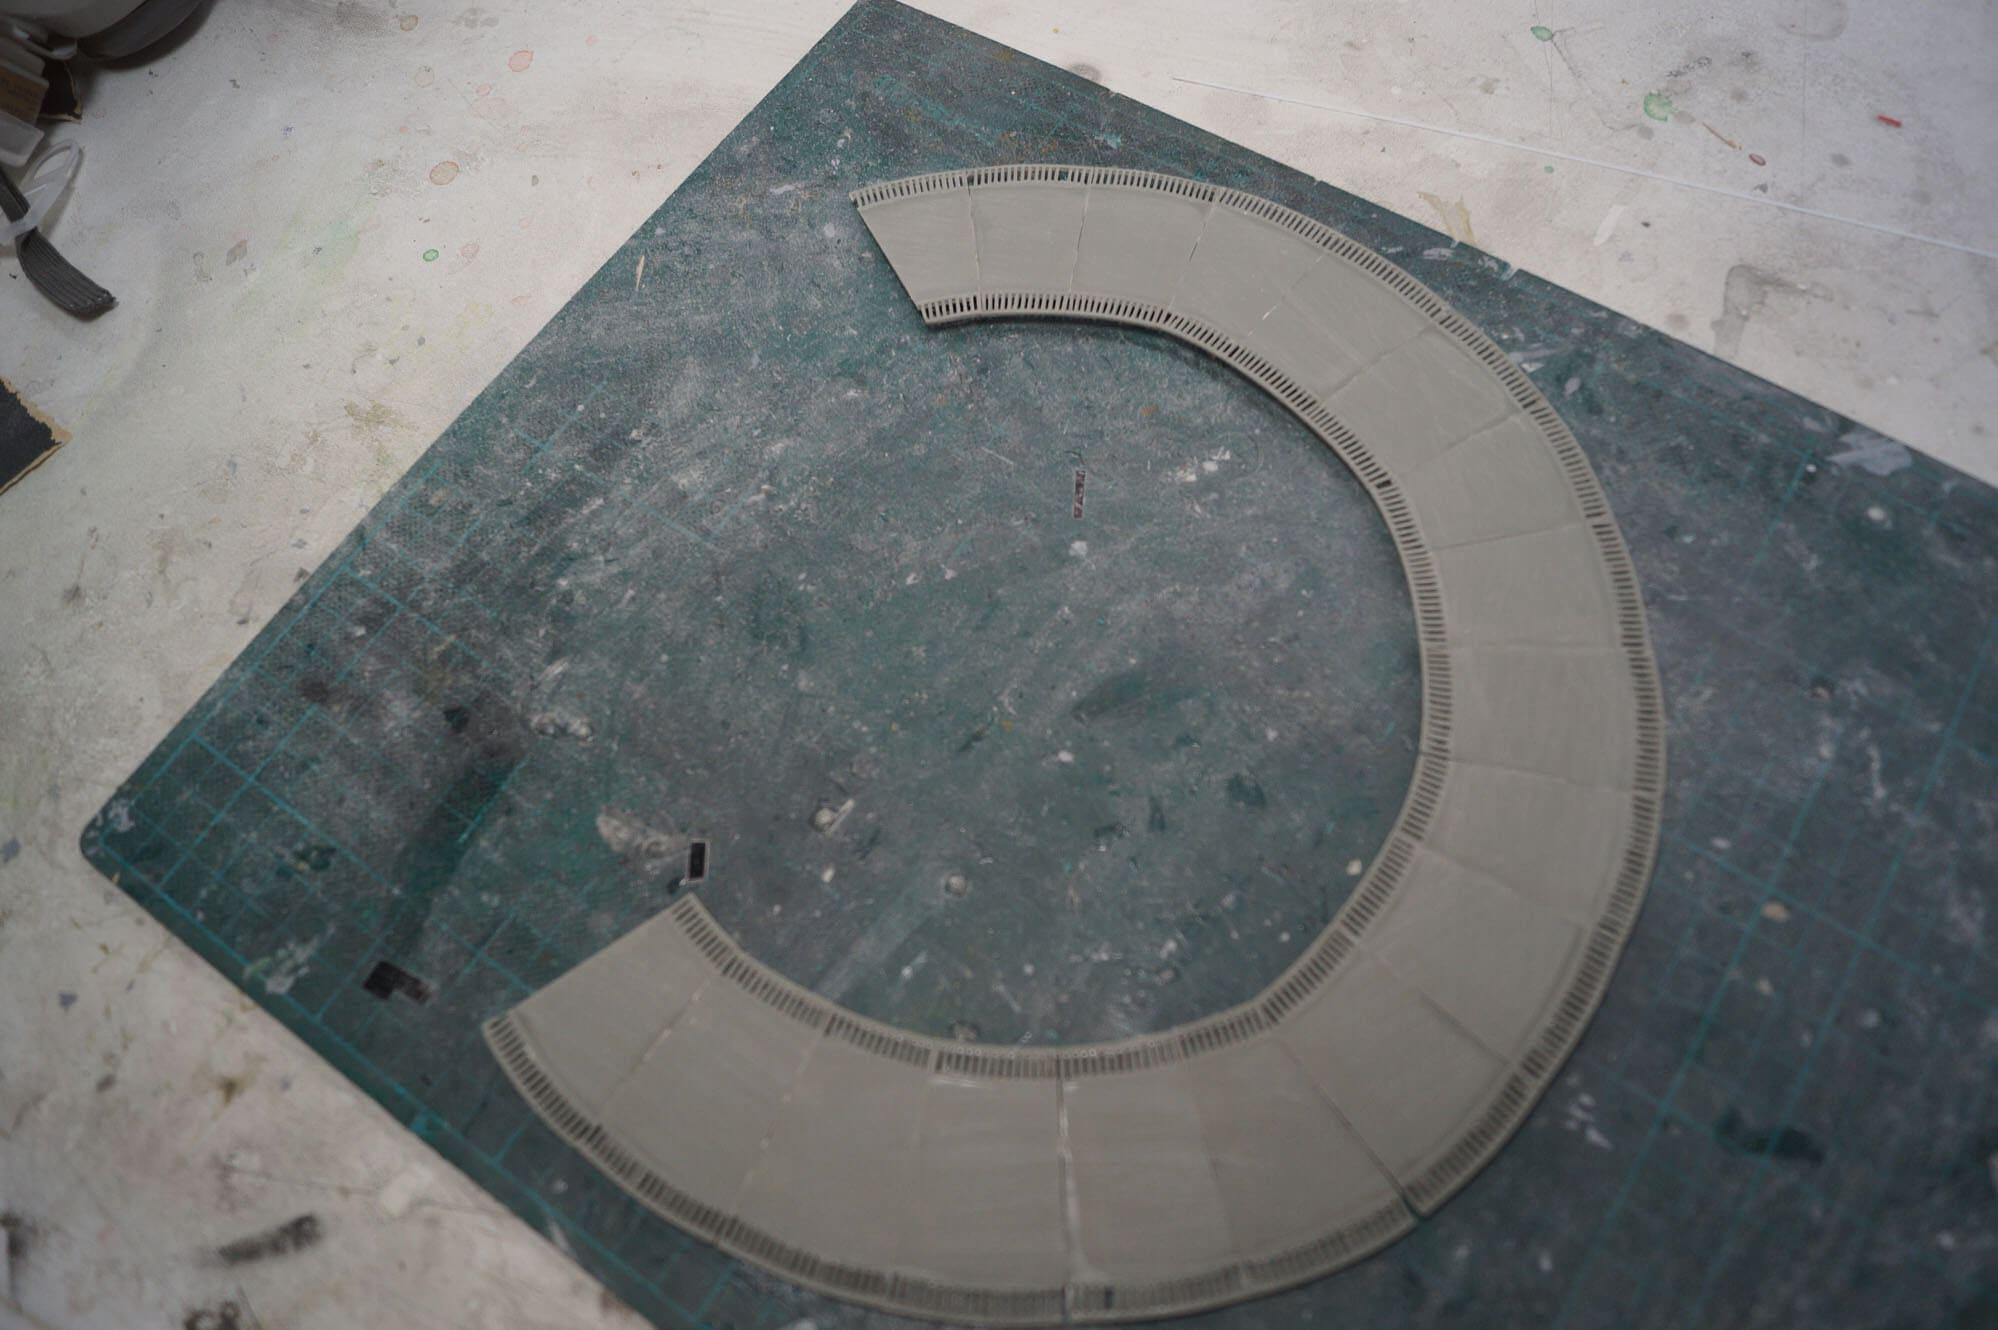 Faucon Millenium Altaya - phase 2 - Page 5 Y4mZ91pl0m2b89nvrBp74Z_fuqvjza5OOu1HsW3kQuJOLeYA8DqI-pqJmz-V0YssFW9PrmDvYefiVJRnLeXYnFMSu5sLufZmdFJwtZIxaq3MHRHIKbQRfyqGv2yIUZlpAX8qCghJuKxjGXPJg9k1vTndAL5TRZocFJ33G2qGfxDqnBf2zMOeImNfWZRrbMLvh97pdtkAHRJcoNVdd7V5EdPaw?width=1998&height=1330&cropmode=none